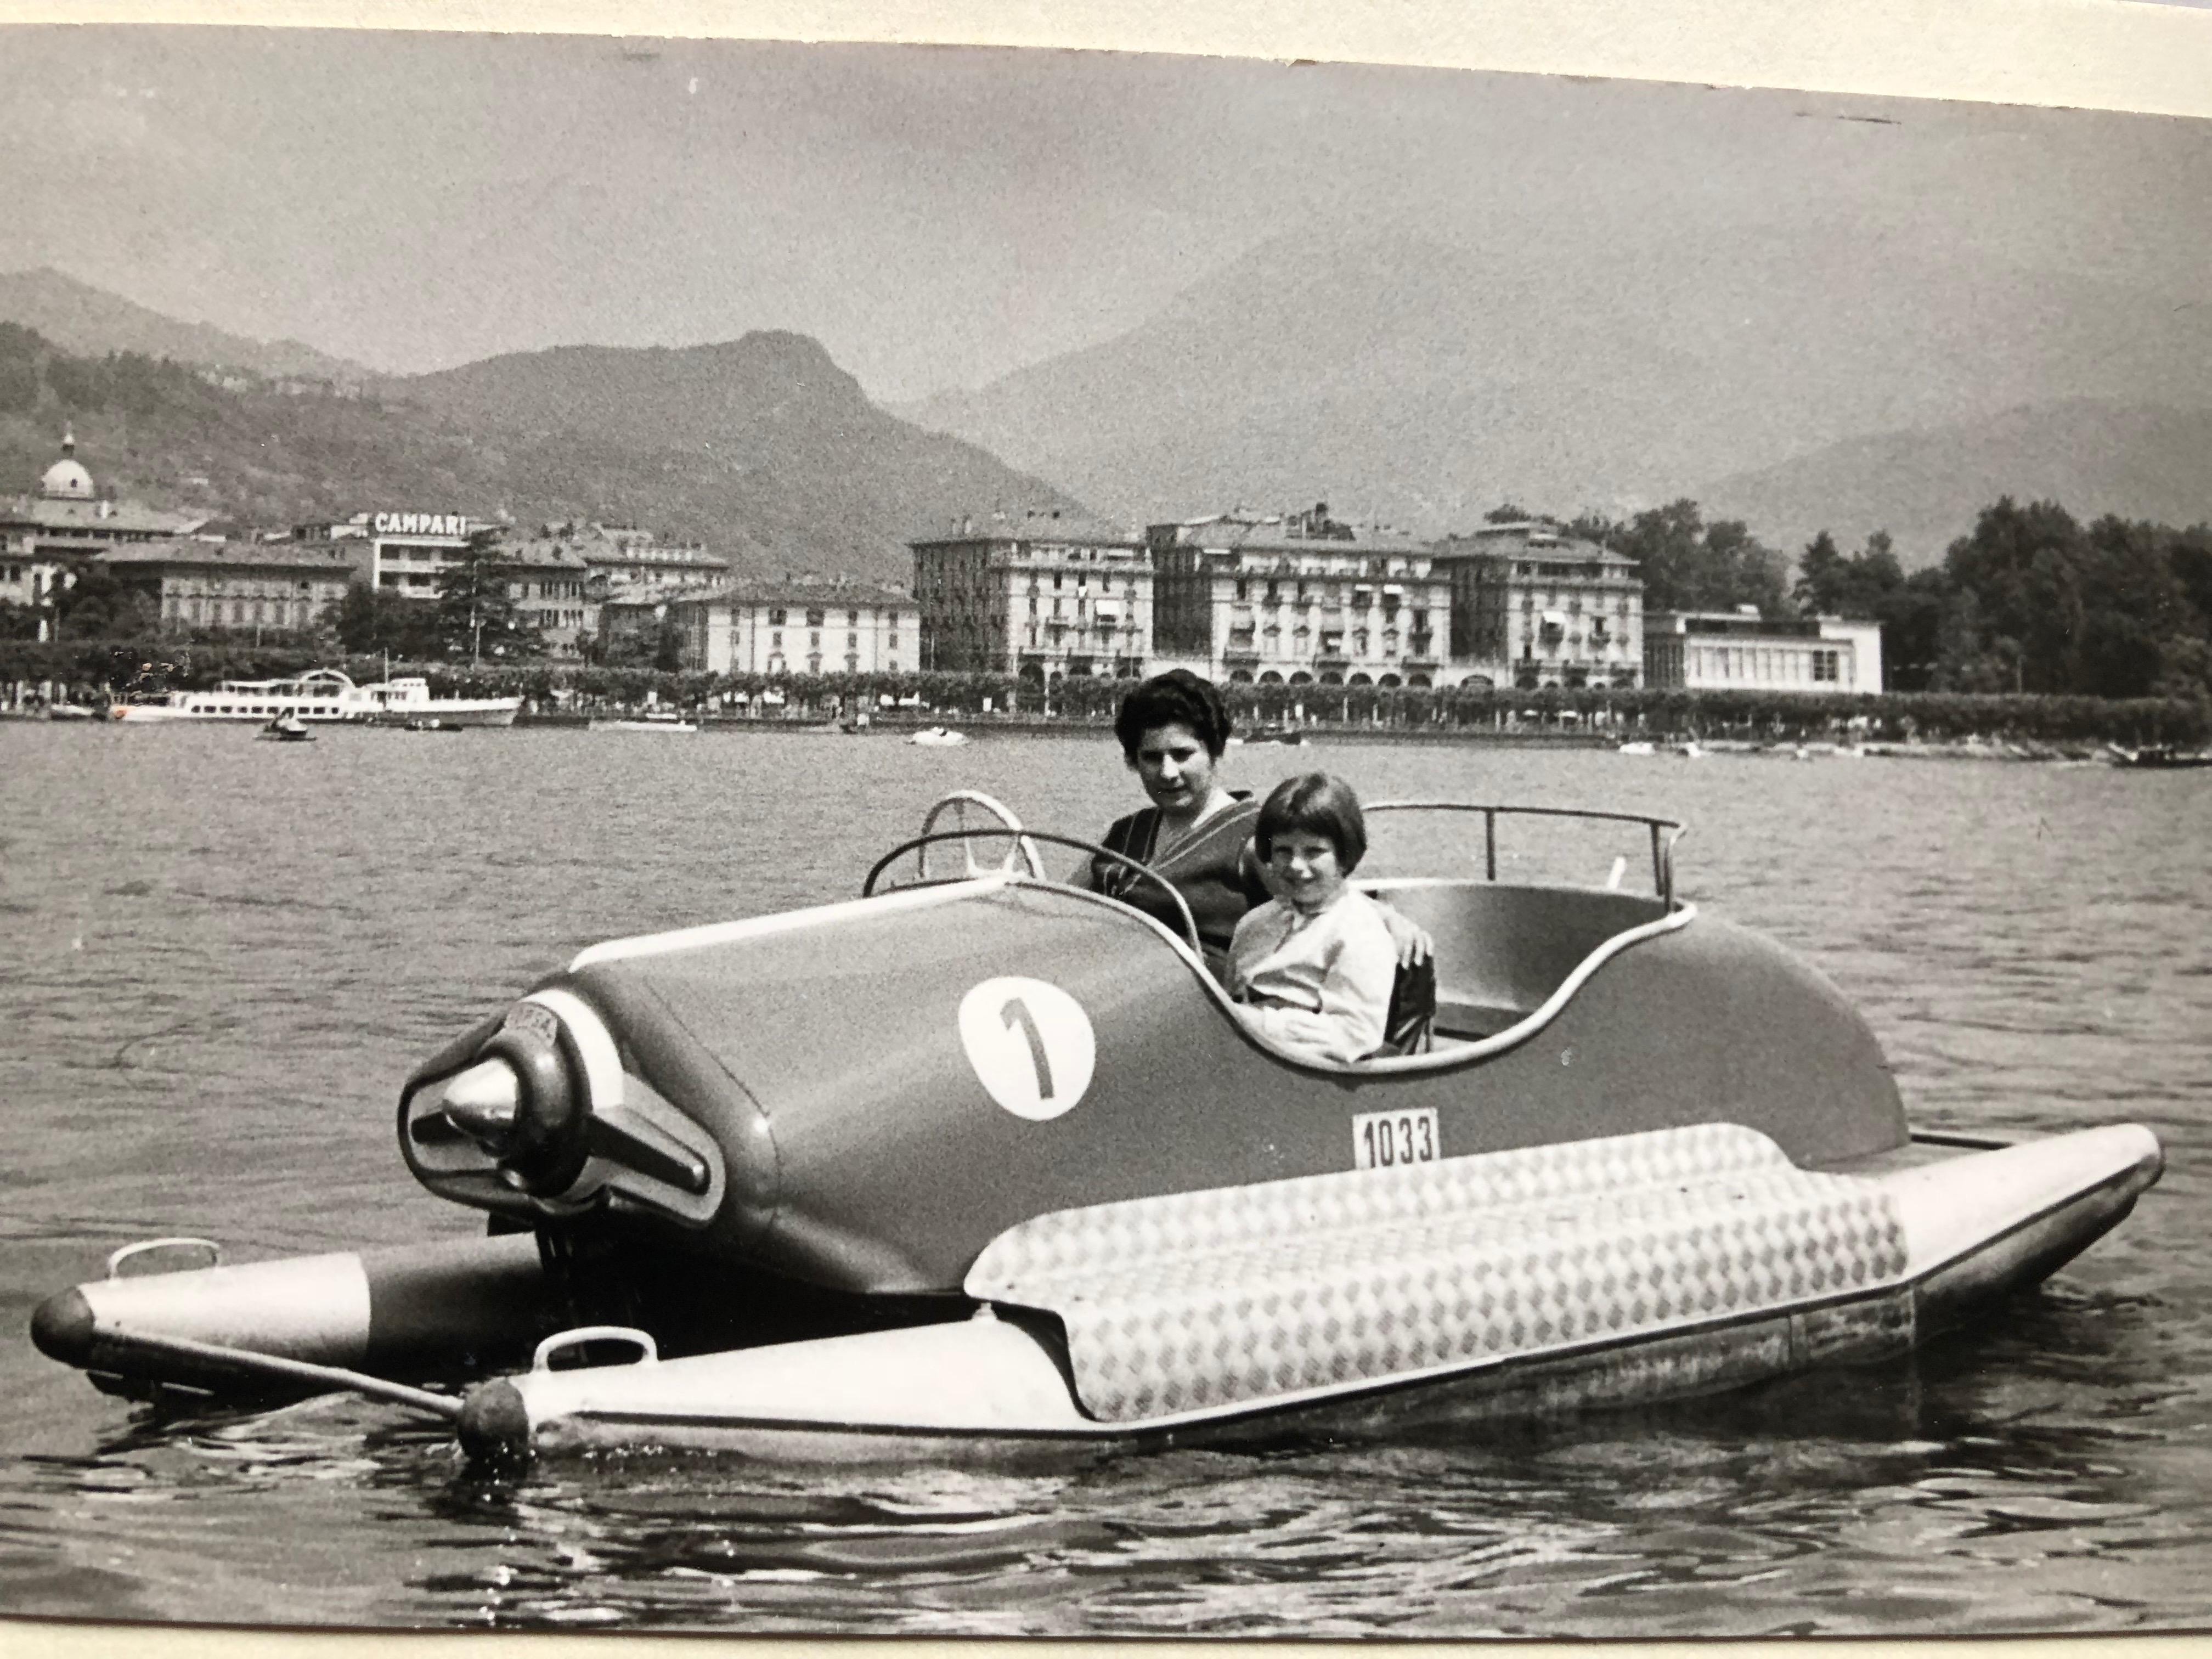 Lugano 1958